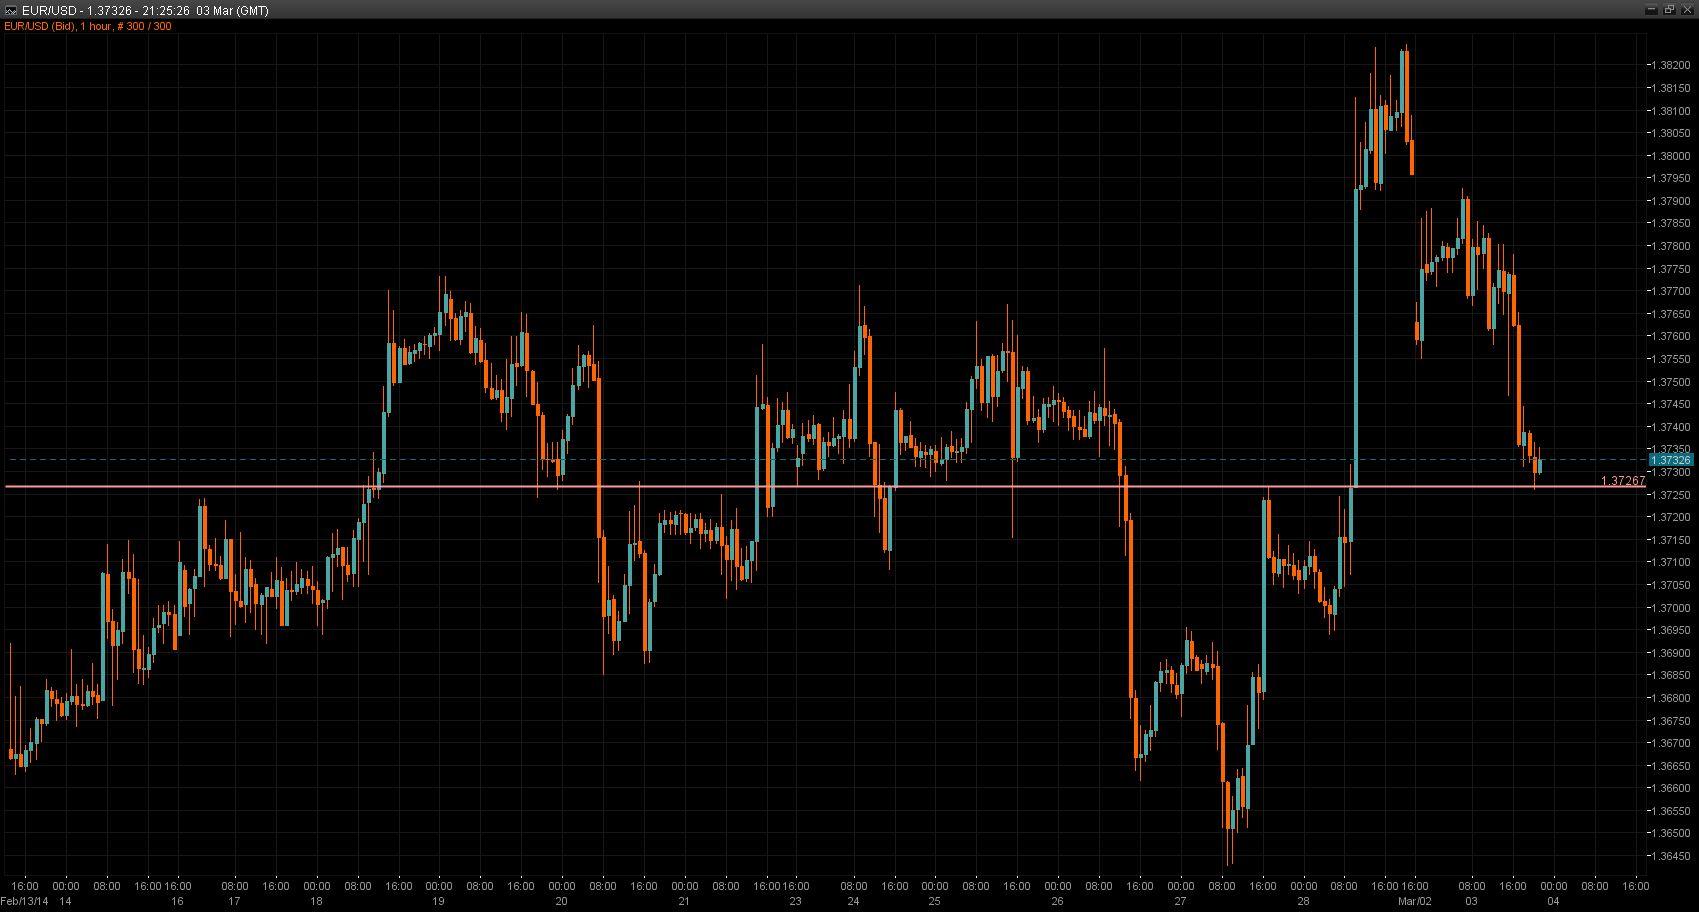 EUR/USD Chart 03 Mar 2014